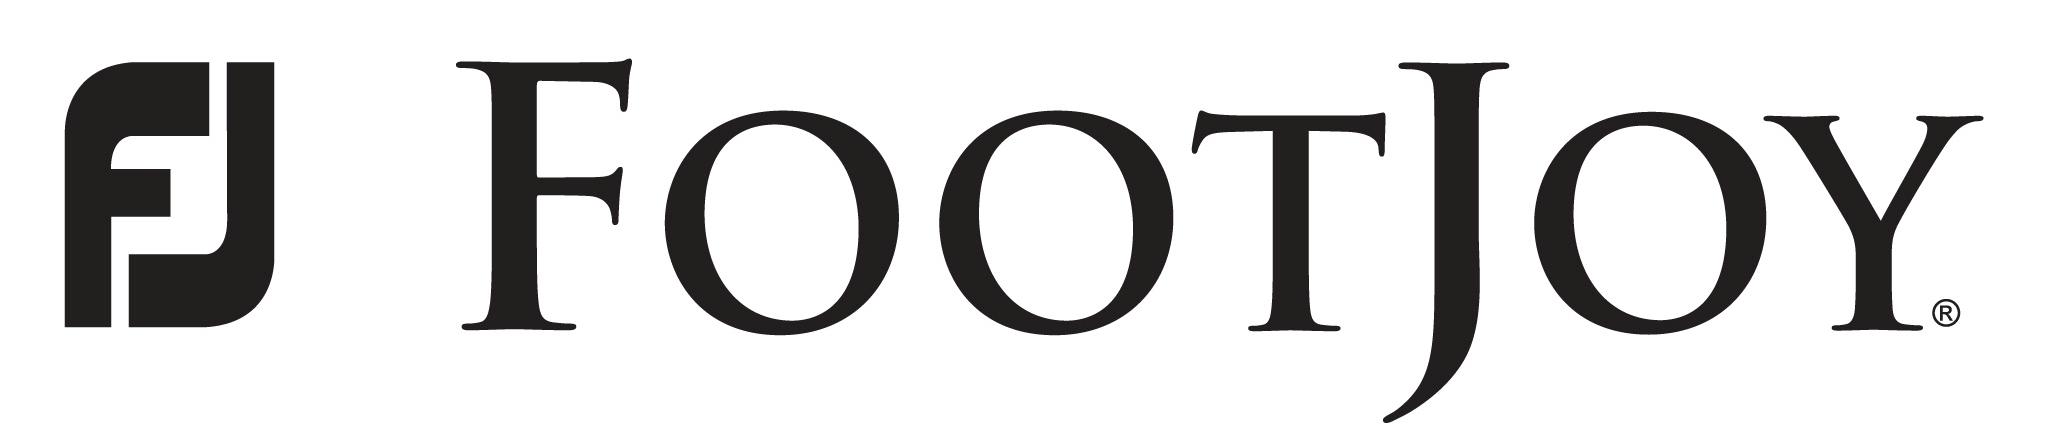 Titleist footjoy west coast masters breinholtg rd golf for Footjoy shirts with titleist logo